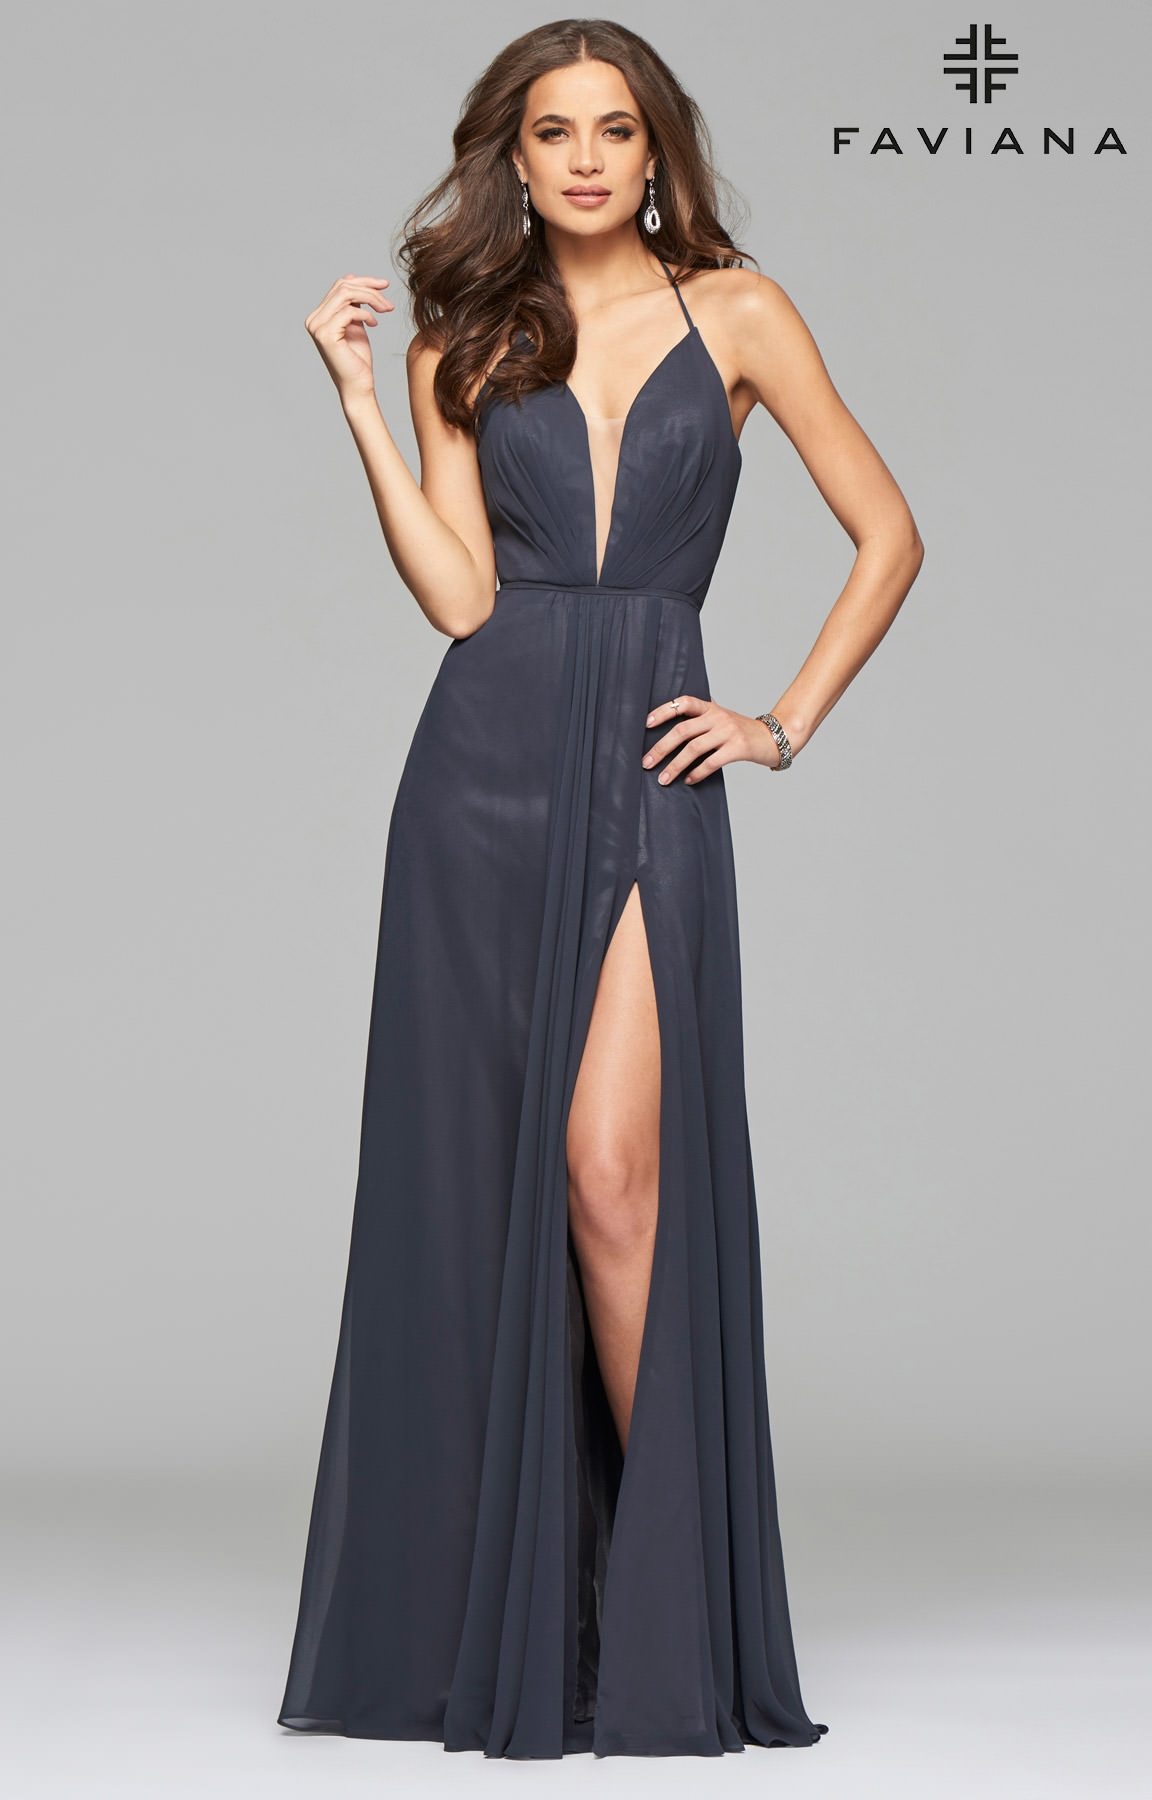 Faviana 7747  Open Corset Back Dress with Low Neckline